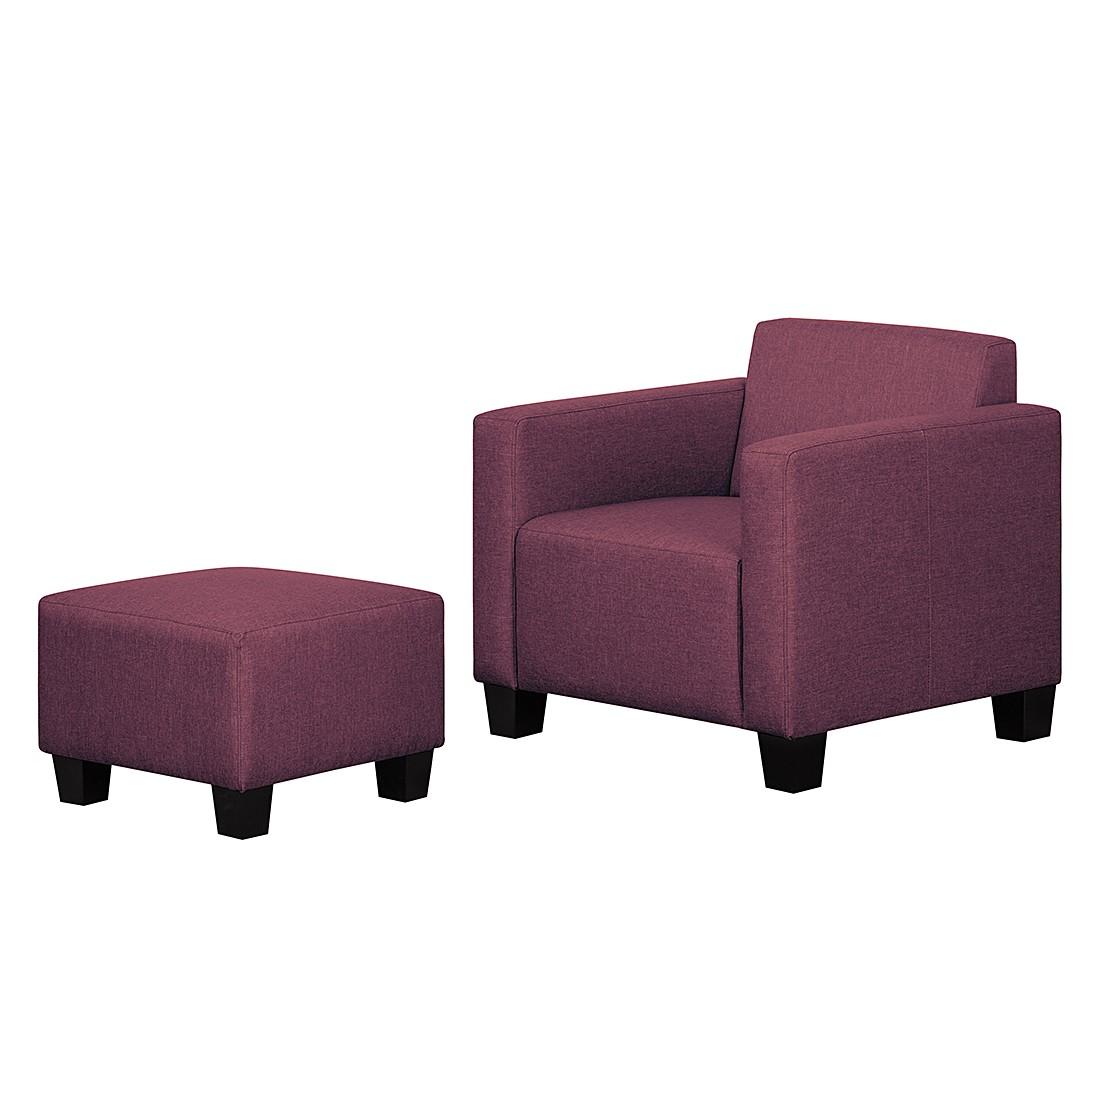 Sessel Morez – Webstoff – Violett, roomscape jetzt kaufen